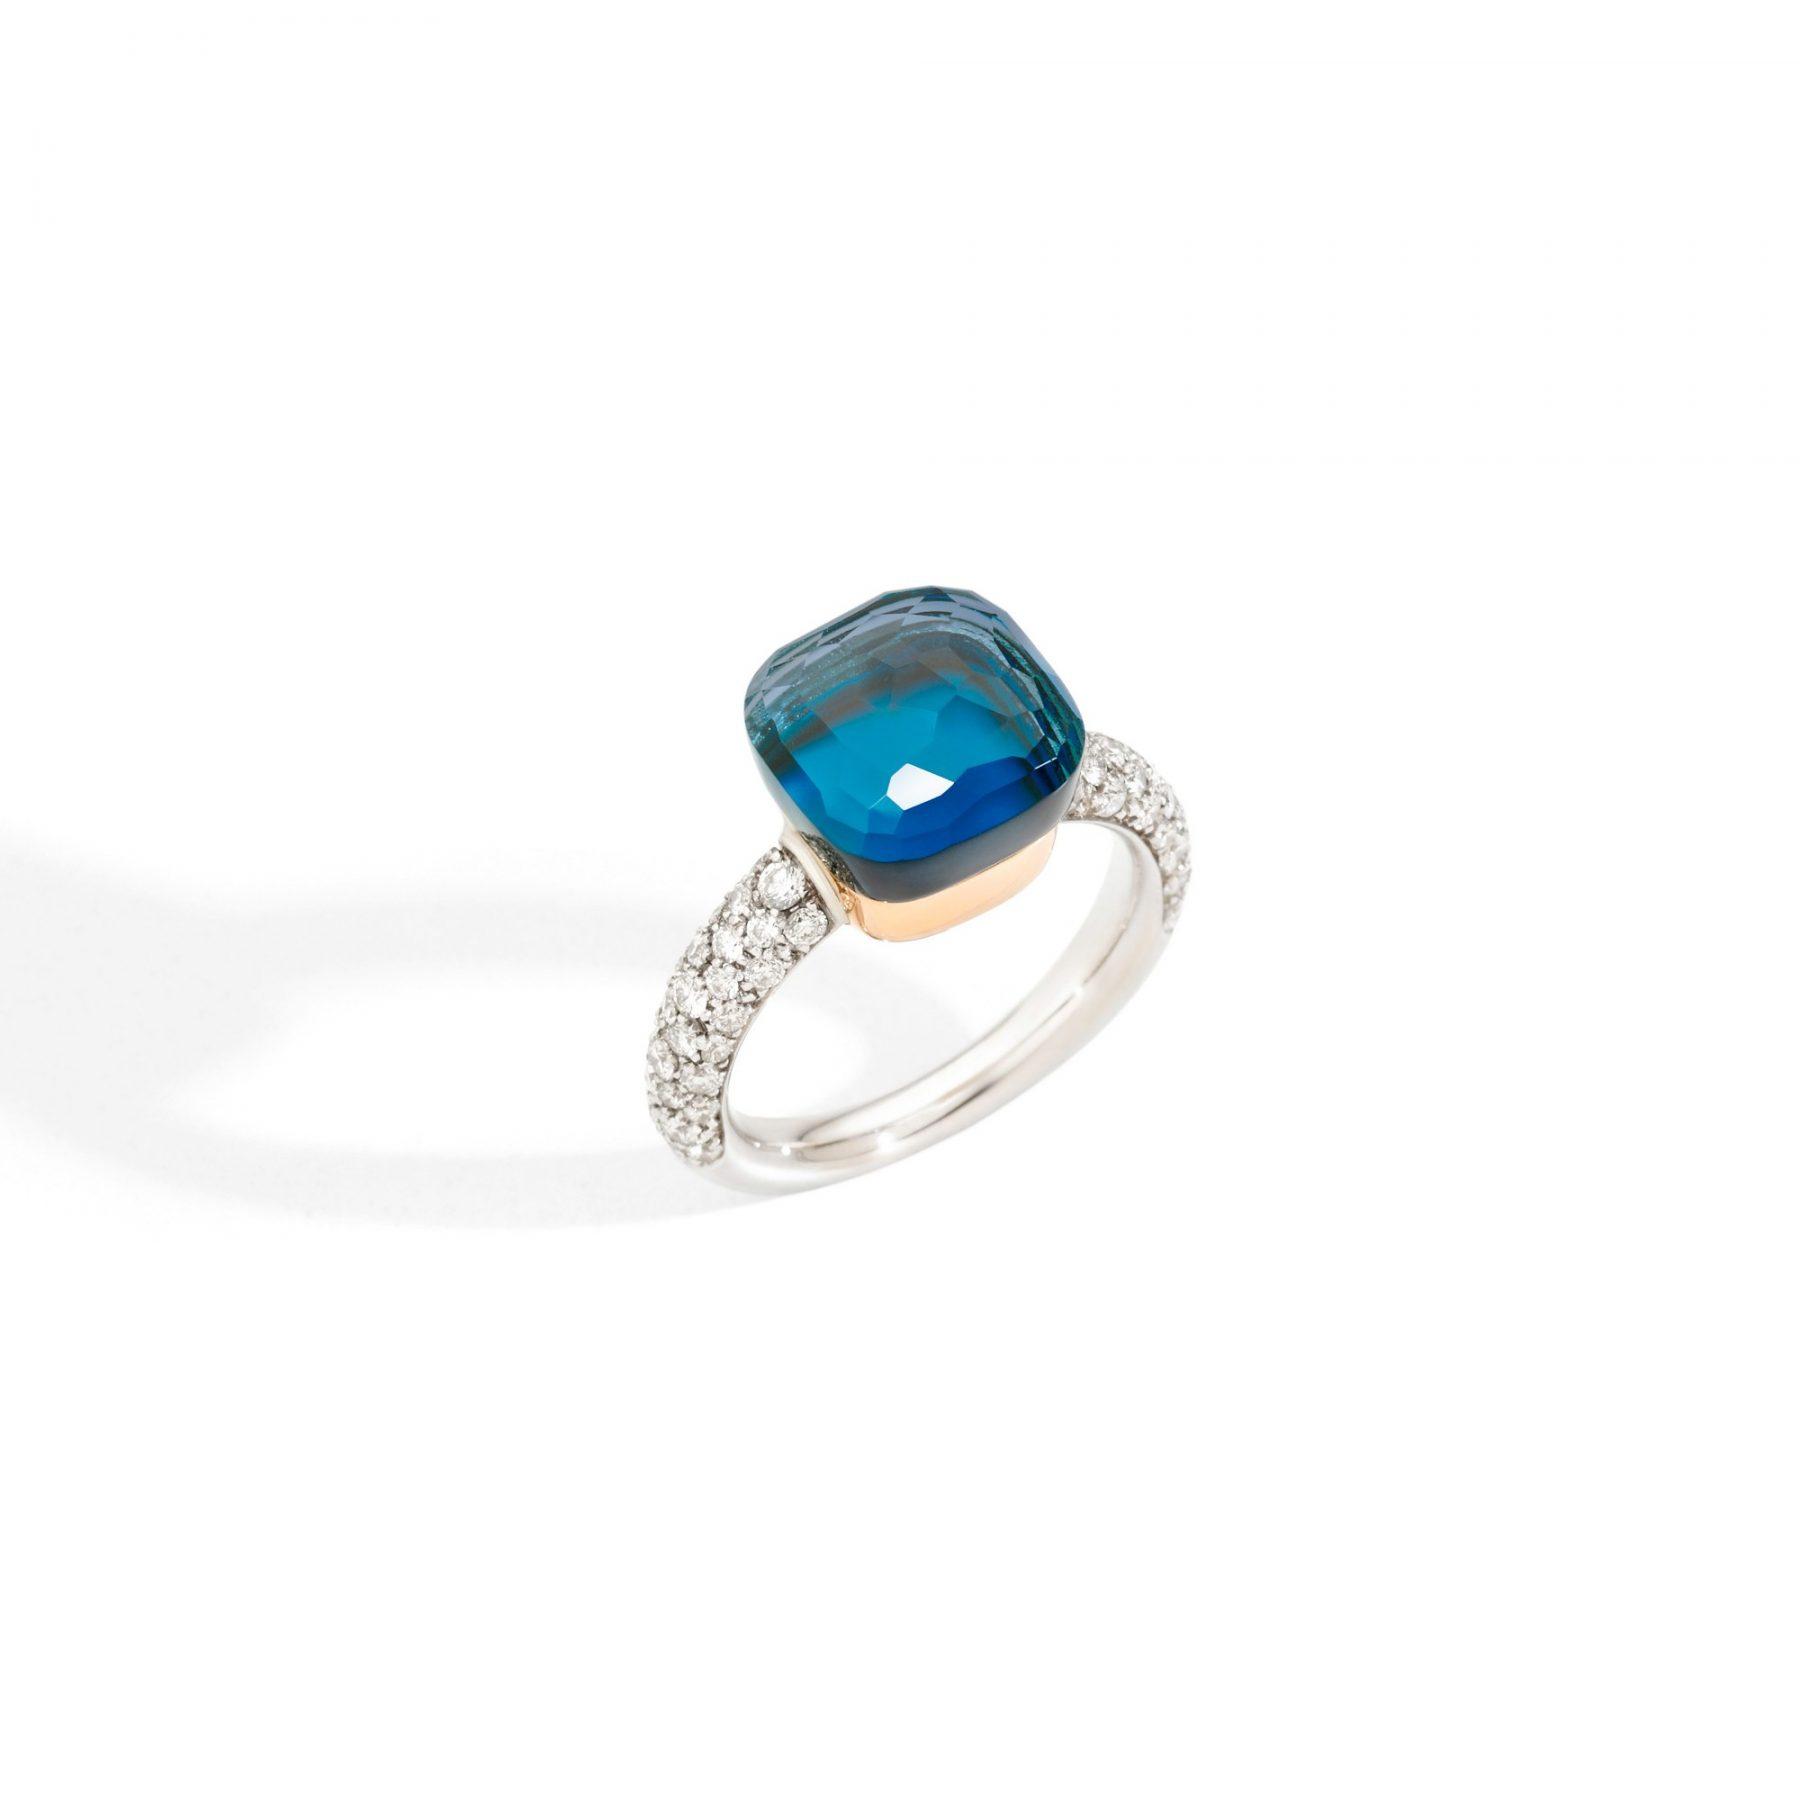 Ring Nudo Classic London Blue Topas - Pomellato - PAC0040O6WHRB0TTU